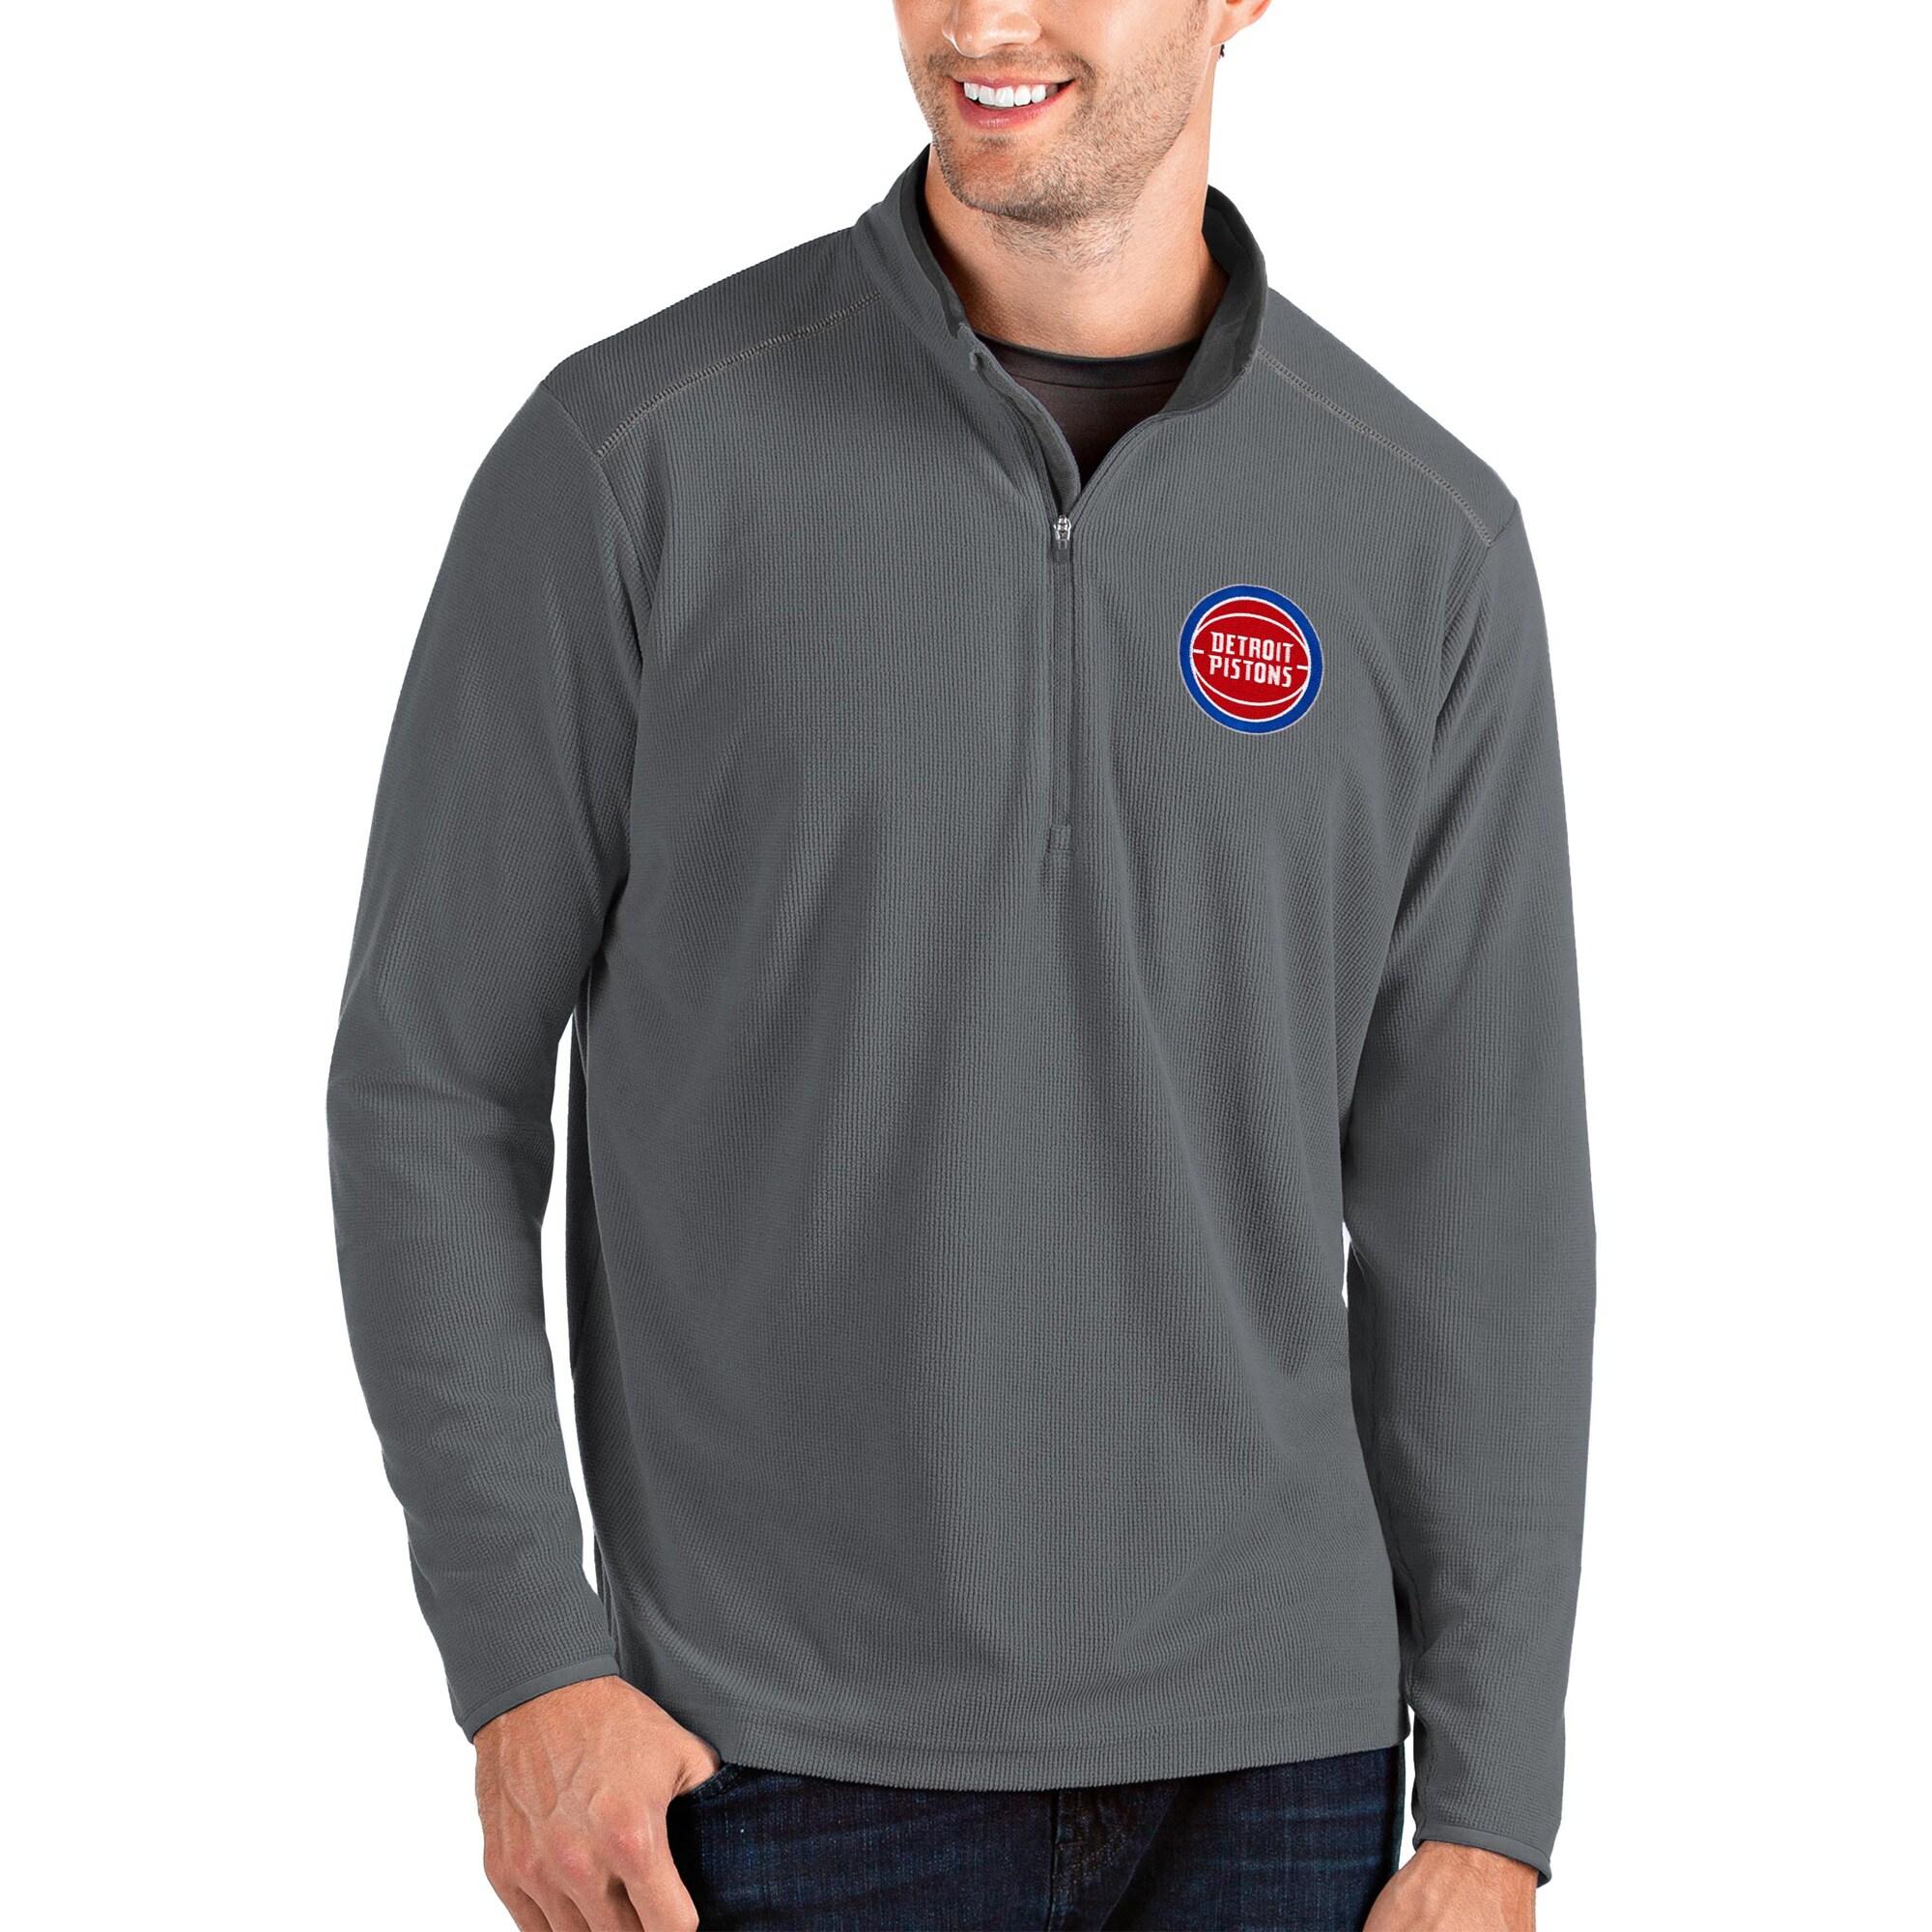 Detroit Pistons Antigua Glacier Quarter-Zip Pullover Jacket - Charcoal/Gray